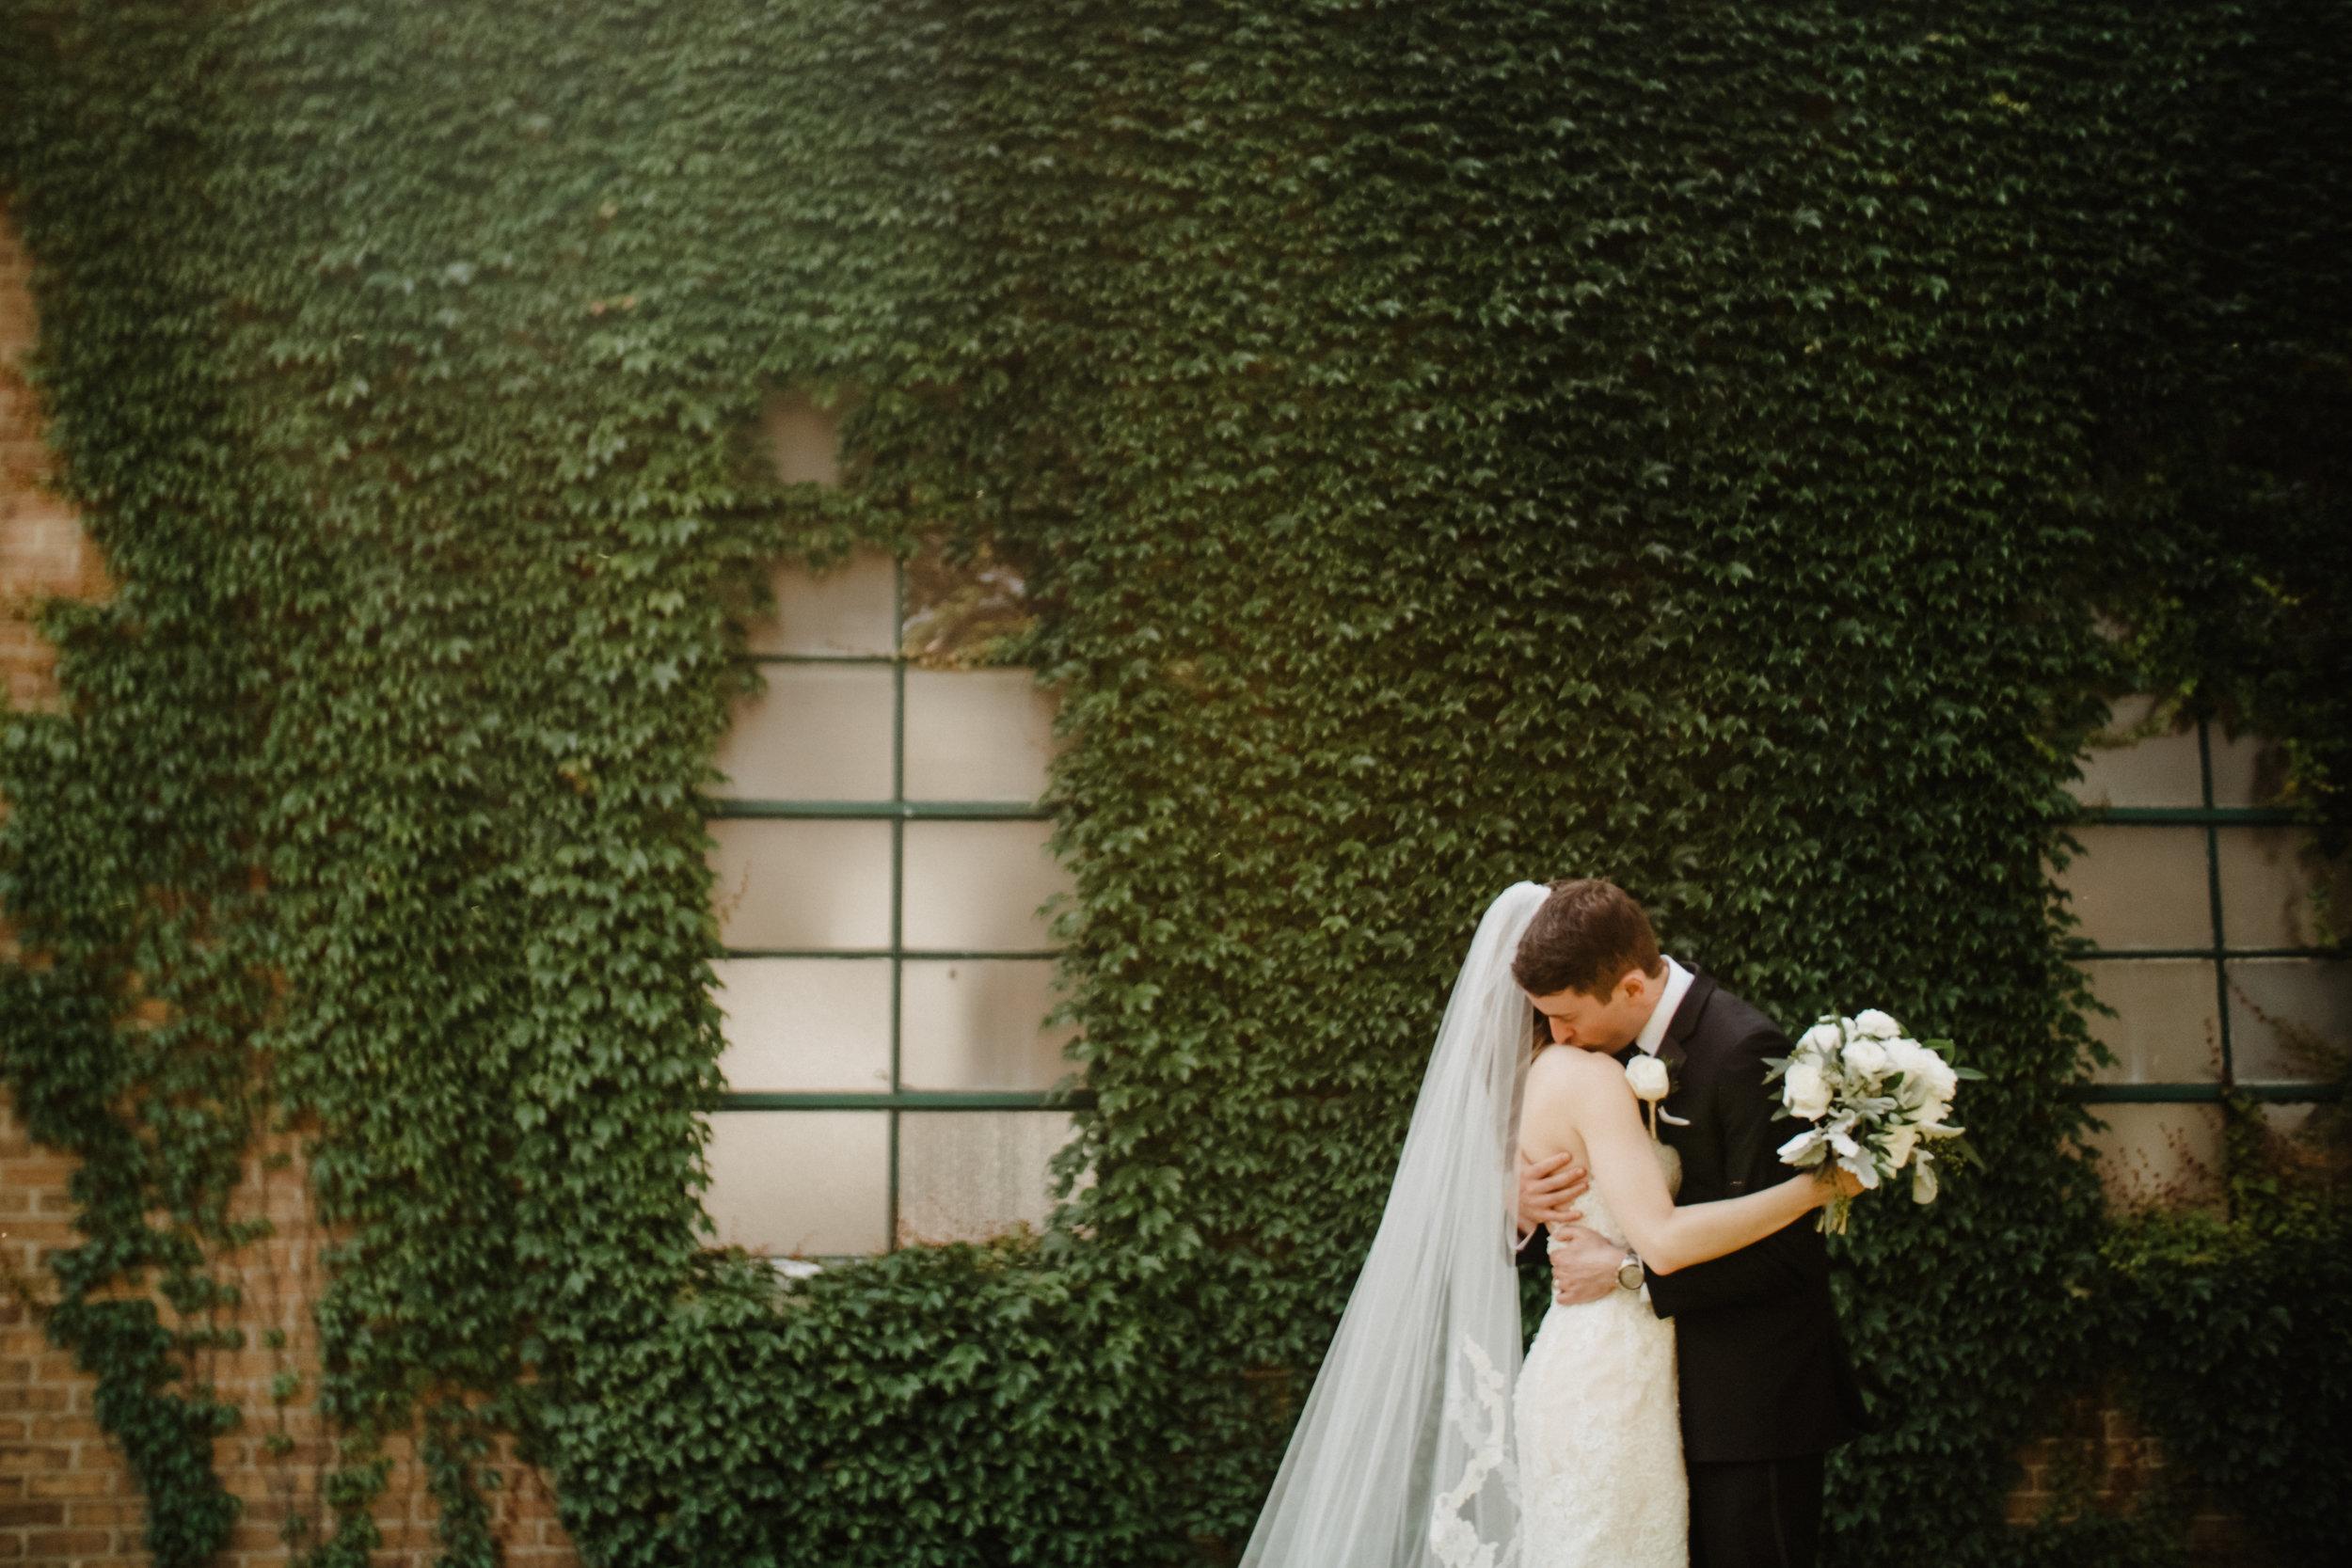 Janet-Alex-Benton-Harbor-Wedding-Party-01